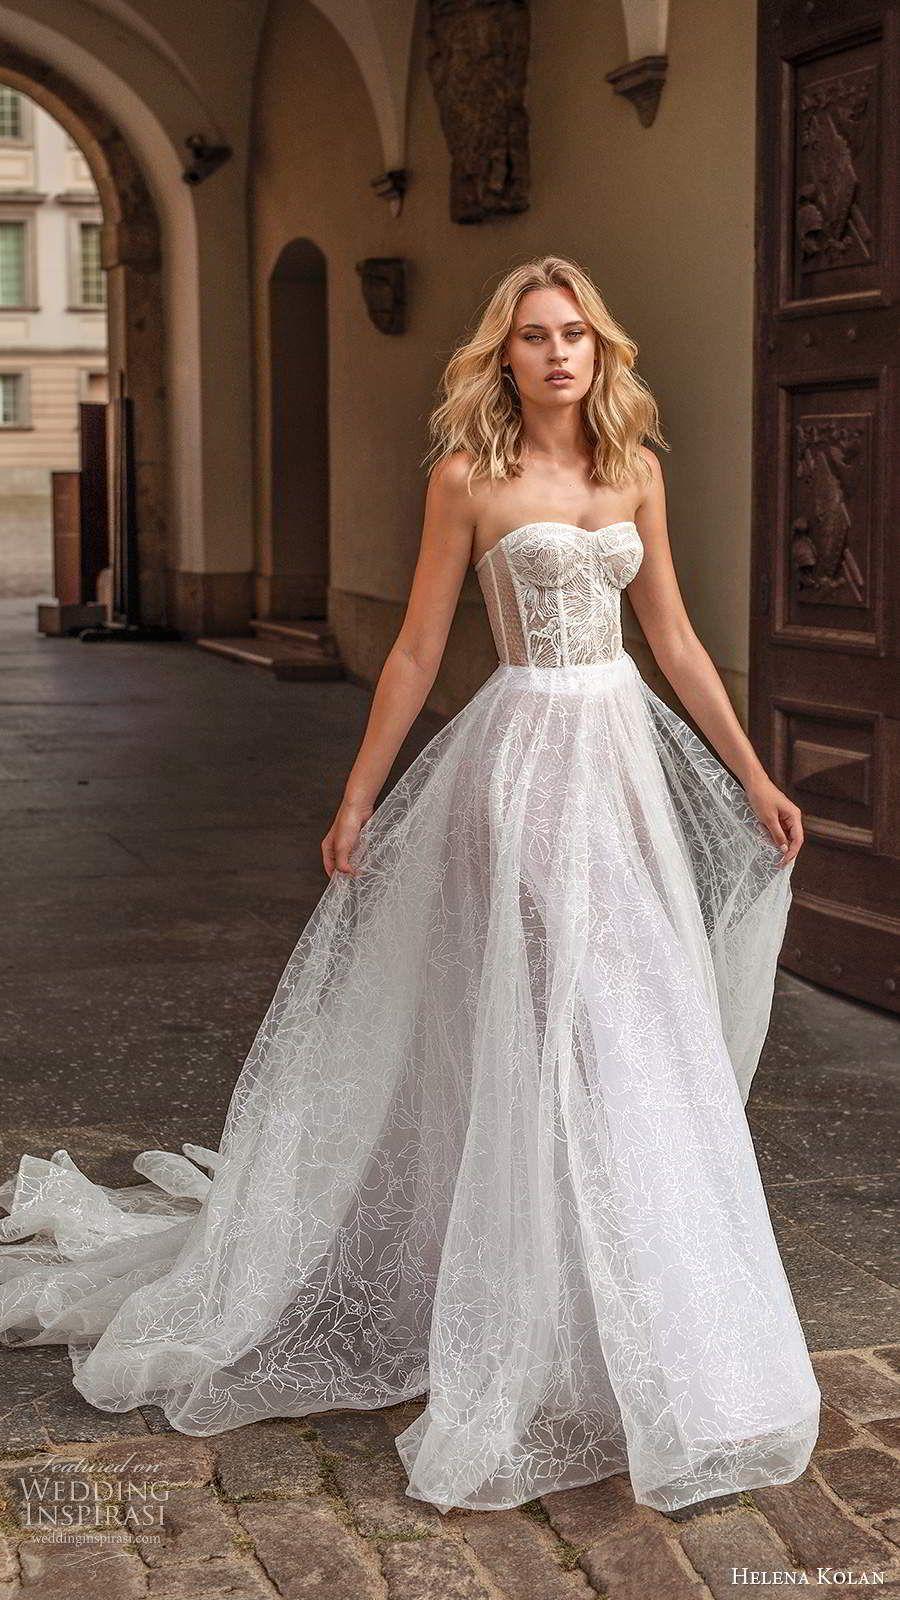 Helena Kolan 2020 Wedding Dresses Forever Bridal Collection Wedding Inspirasi Sheer Wedding Dress Ball Gown Wedding Dress Ball Gowns Wedding,Nursing Dresses For Wedding Guest